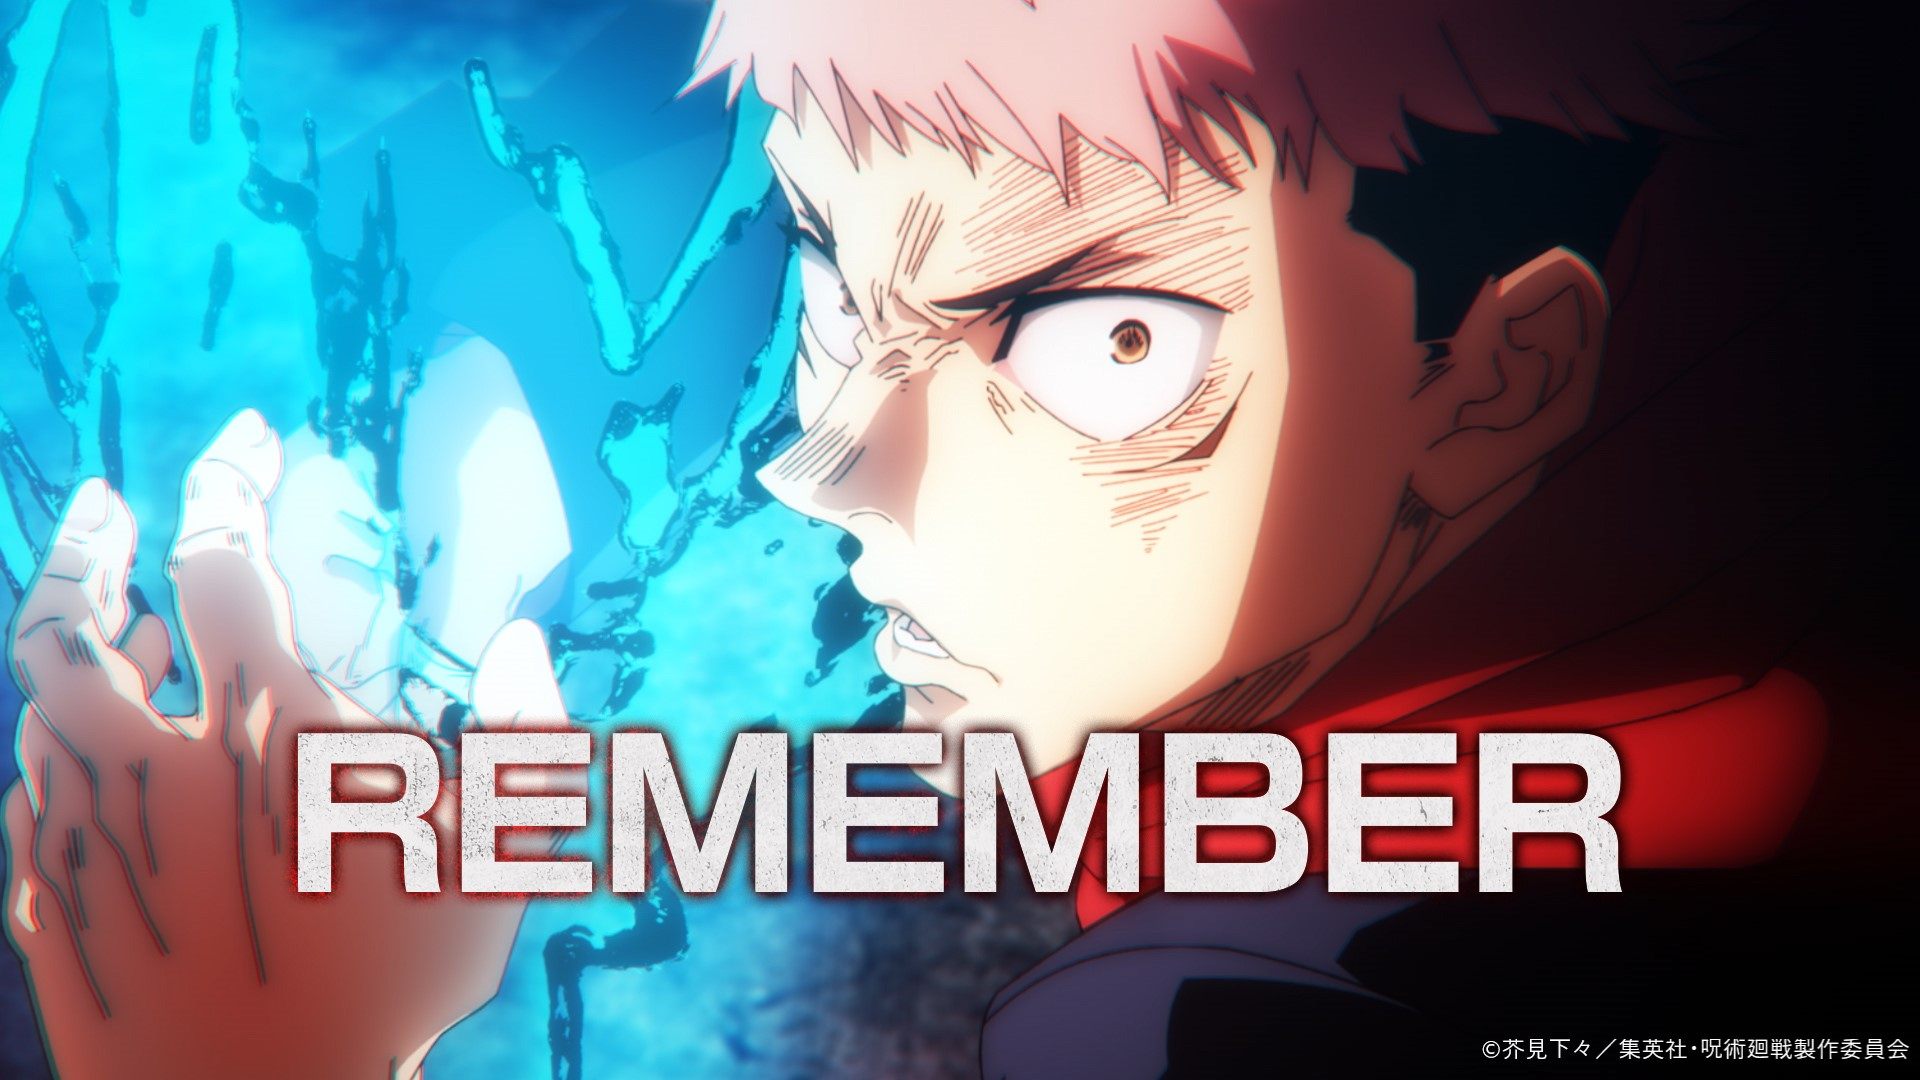 TVアニメ「呪術廻戦」挿入歌「REMEMBER」のリリックビデオが鳥肌もの!何度見ても痺れちゃう戦闘シーン